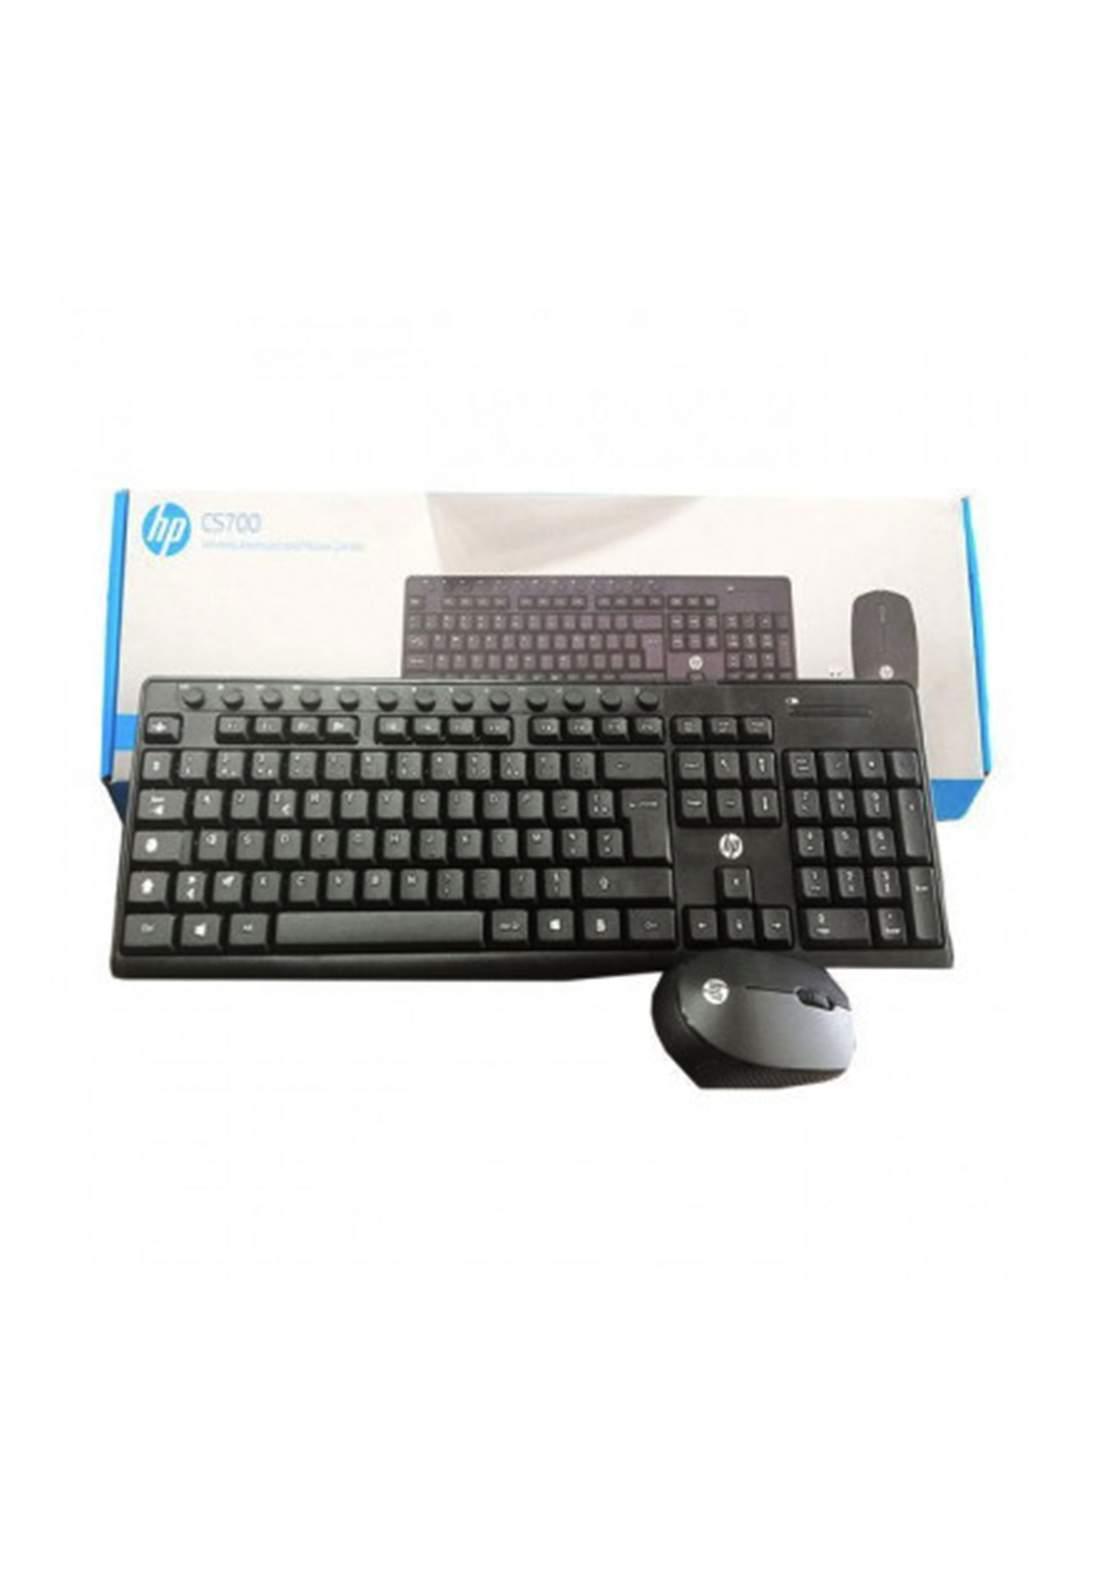 HP Cs700 Wireless Keyboard & Mouse Bundle - Black  لوحة مفاتيح وماوس